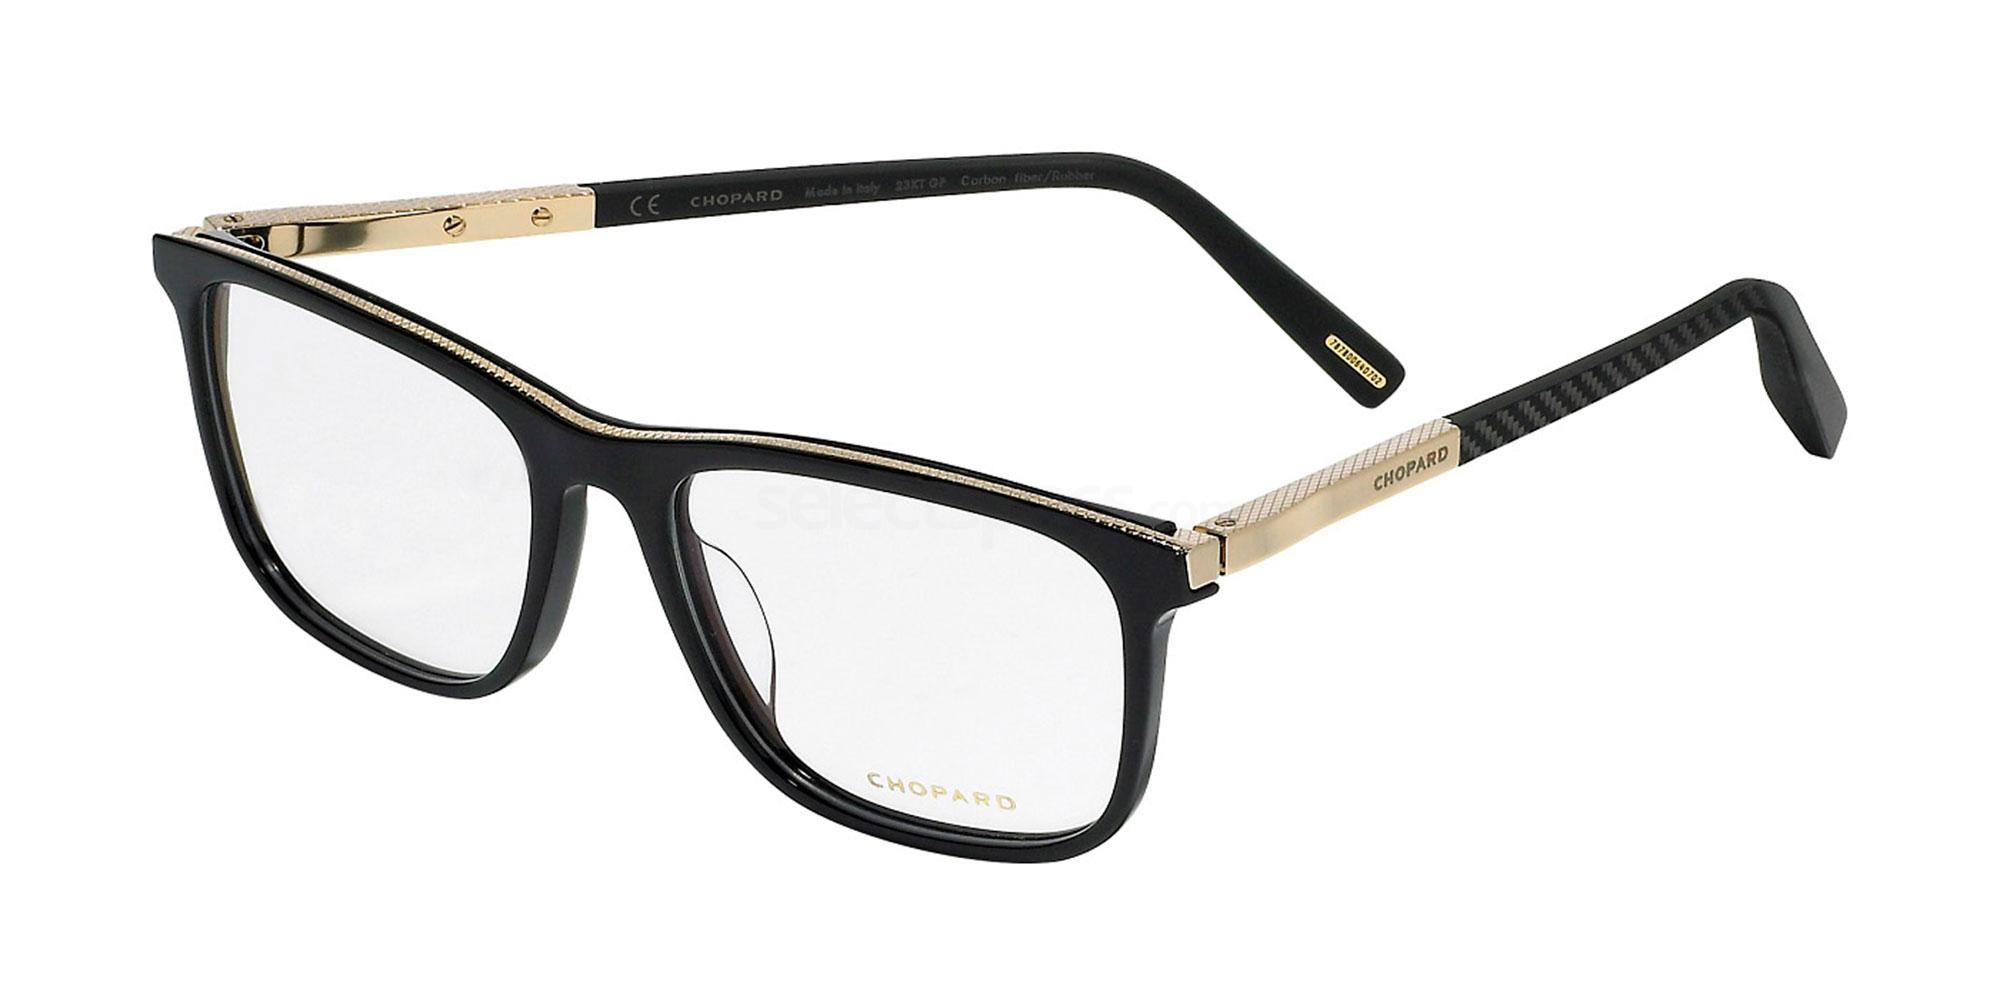 0300 VCH270 Glasses, Chopard